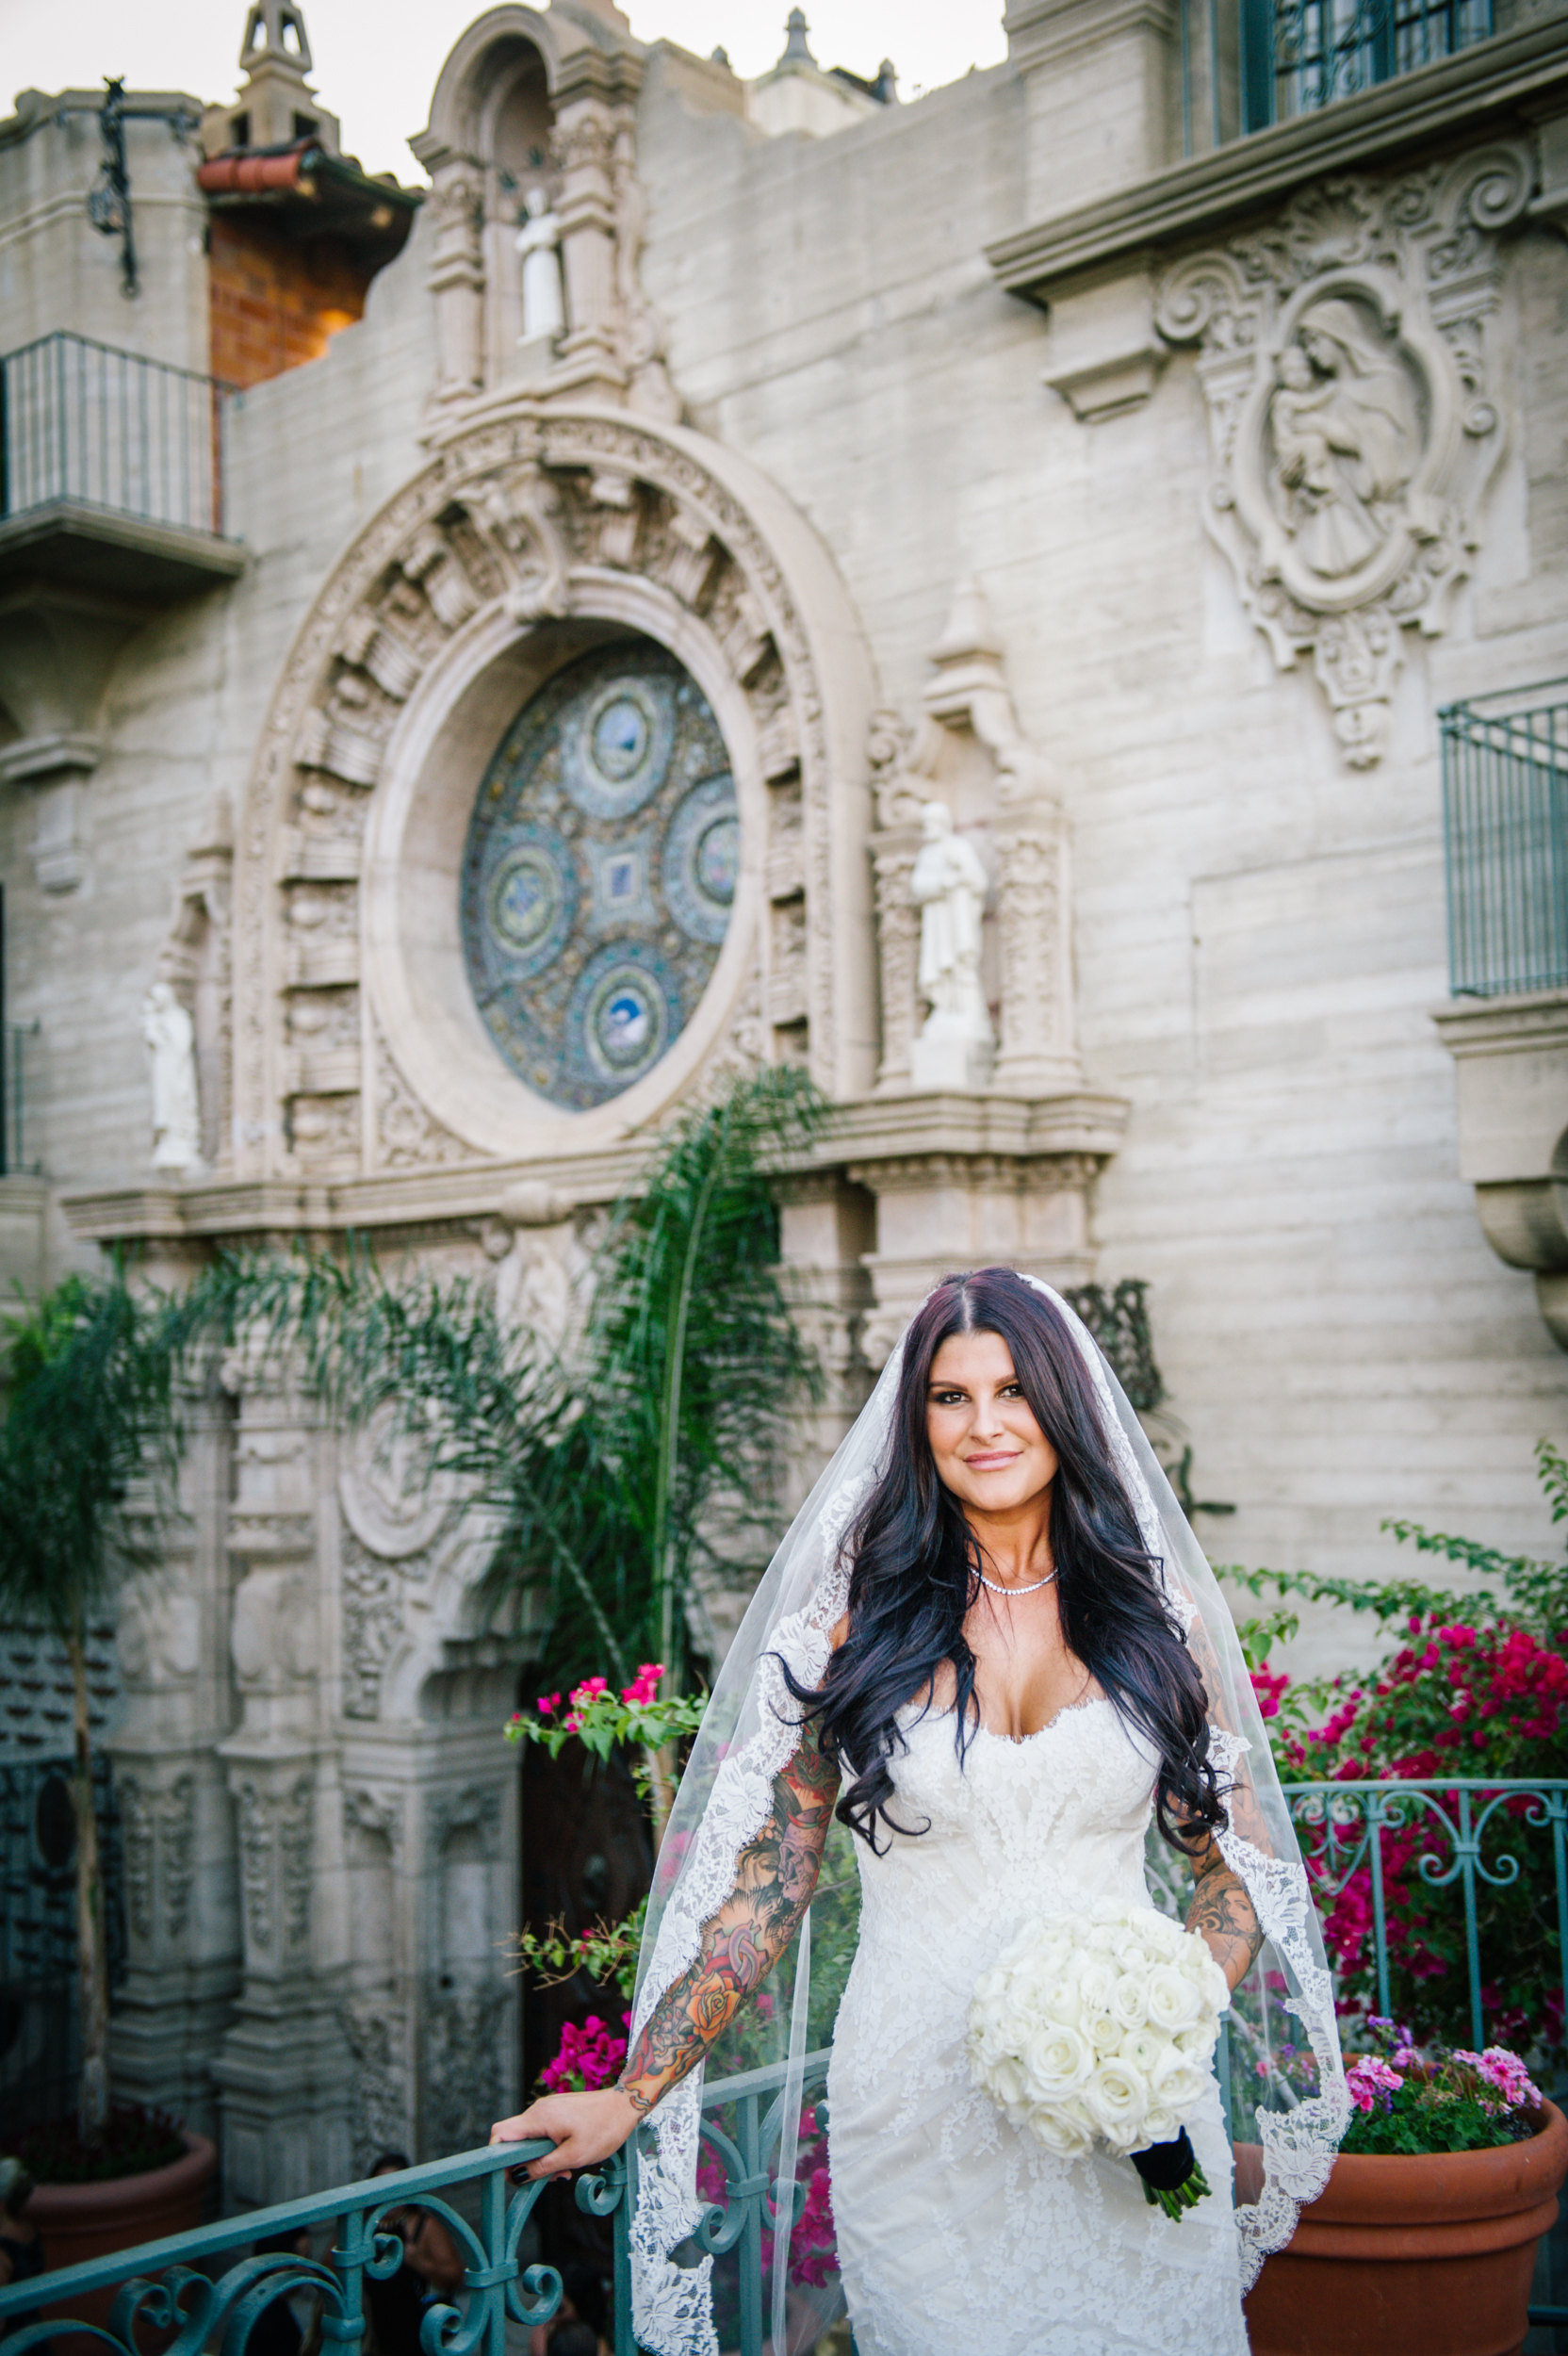 Riverside-Mission-Inn-Wedding-0158.JPG